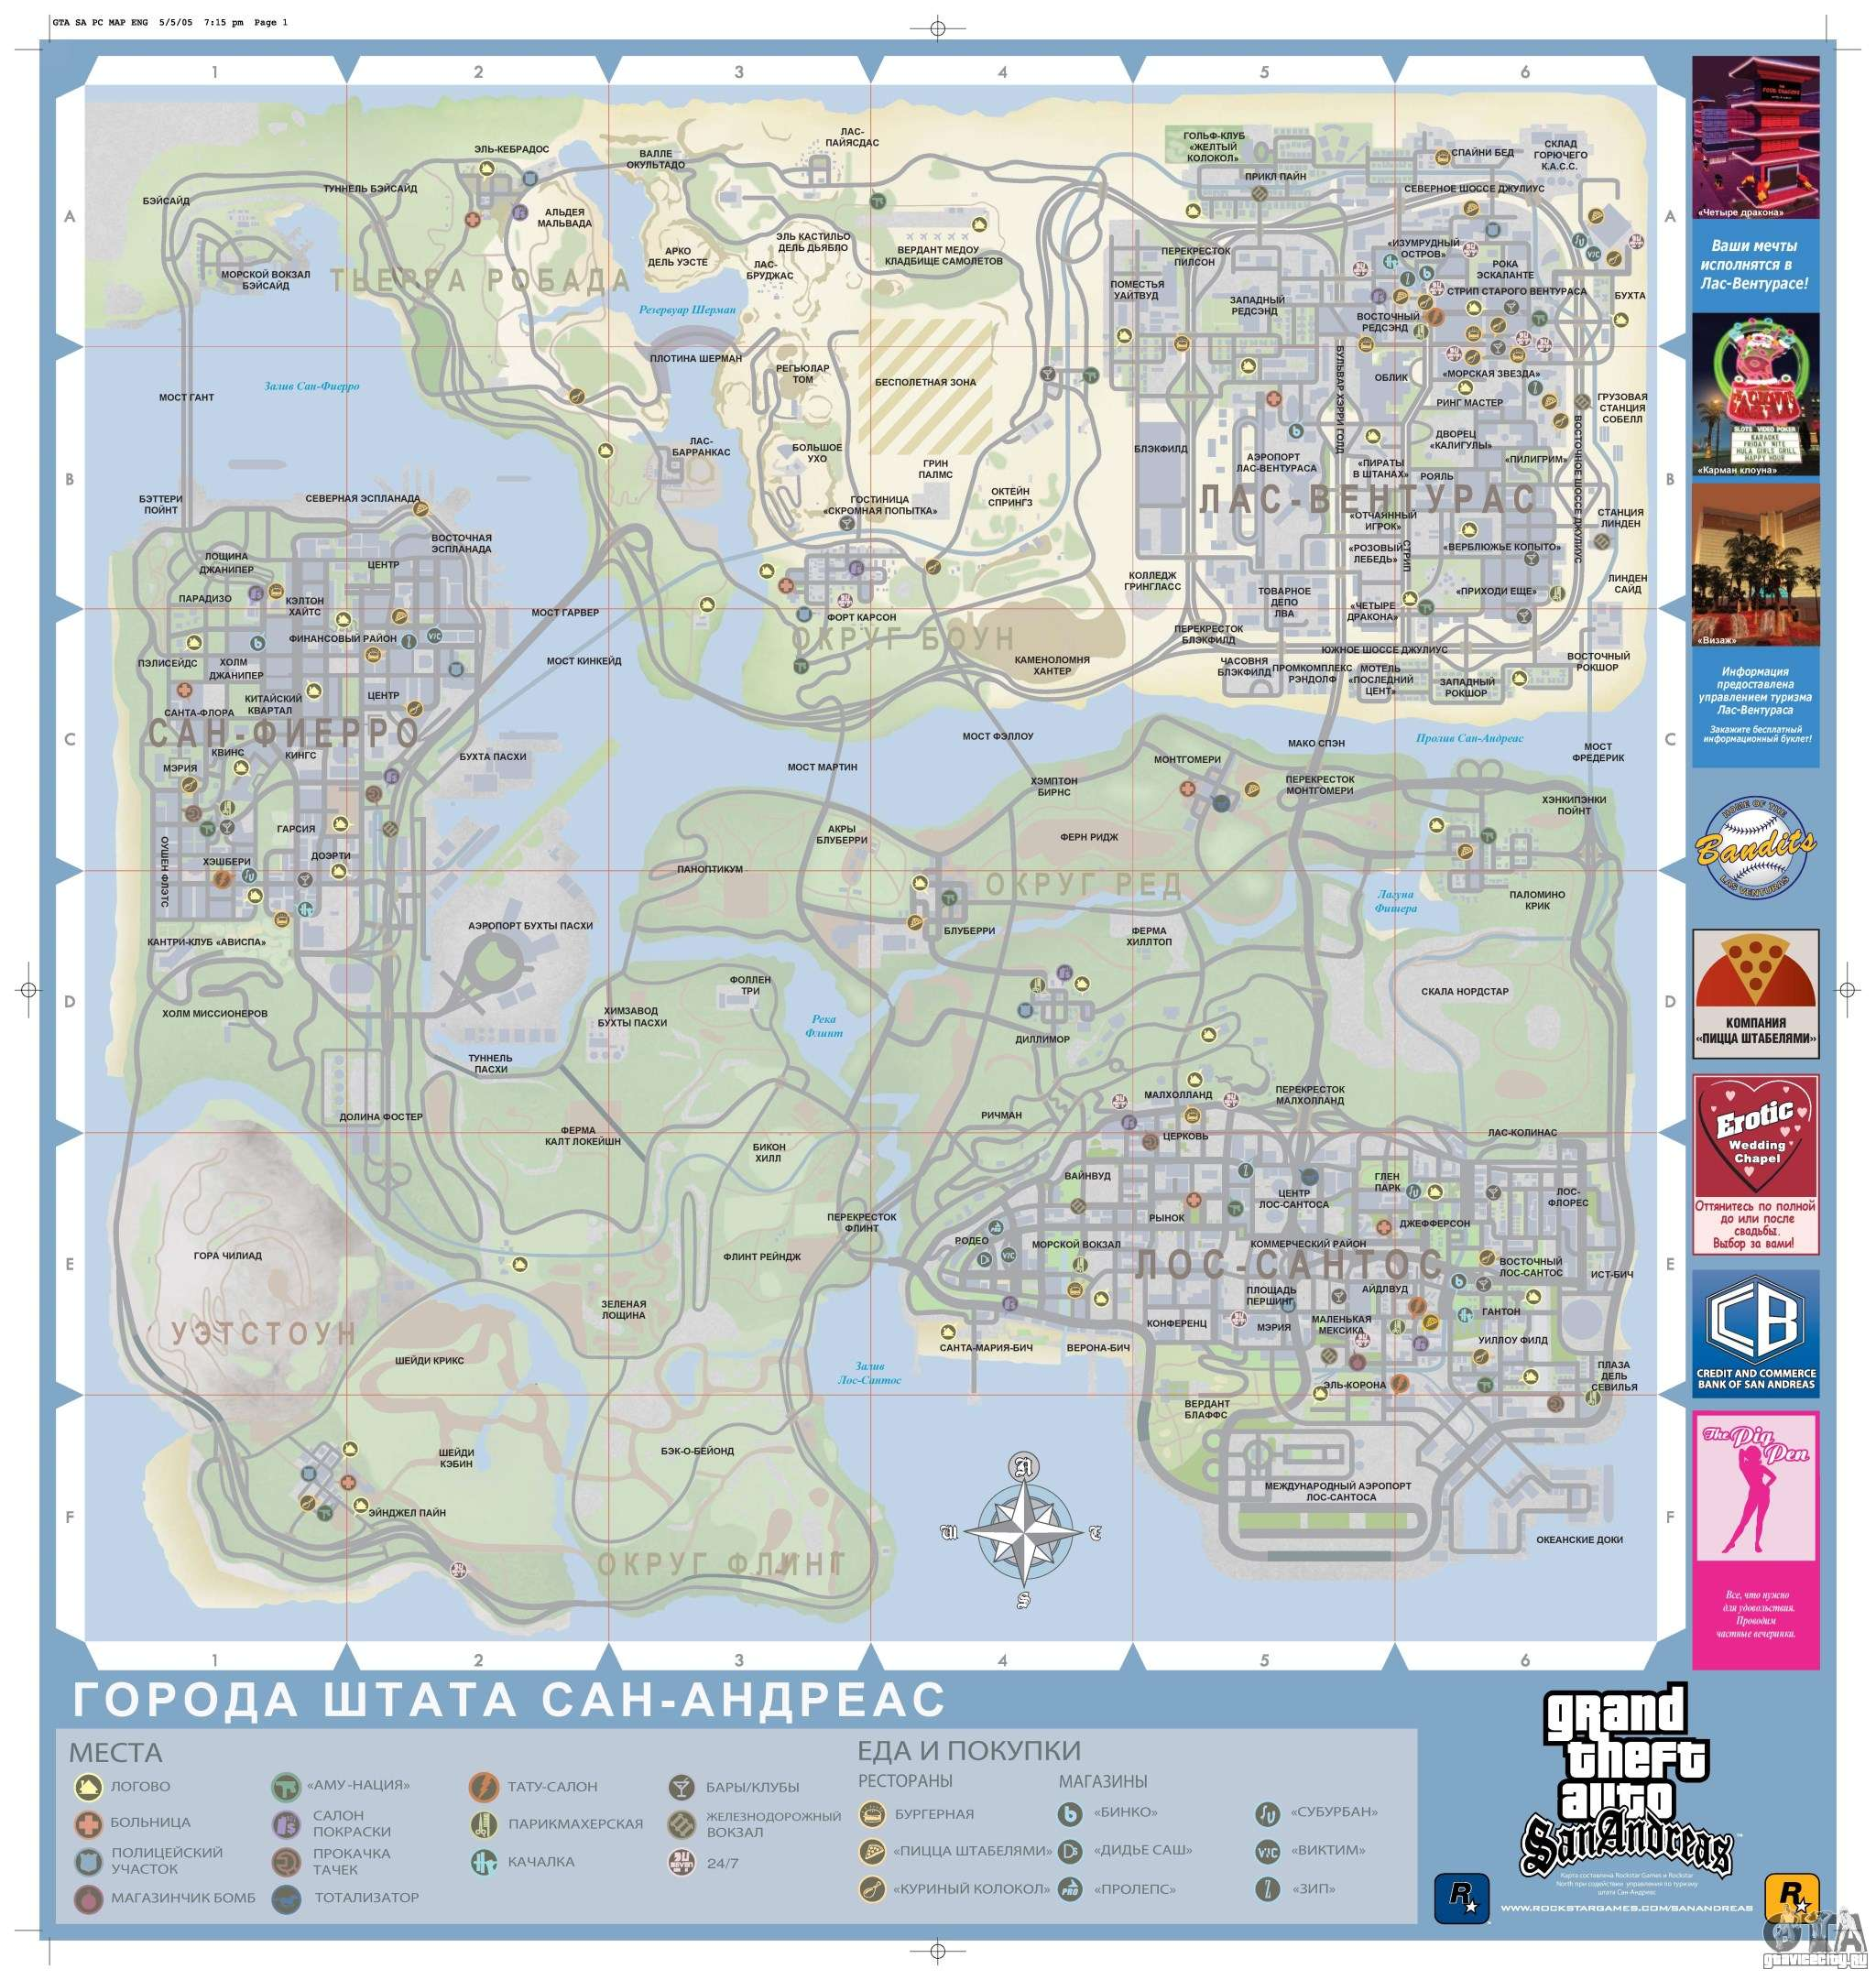 Карта GTA 4 (Liberty City), GTA IV map - Всё о GTA 4